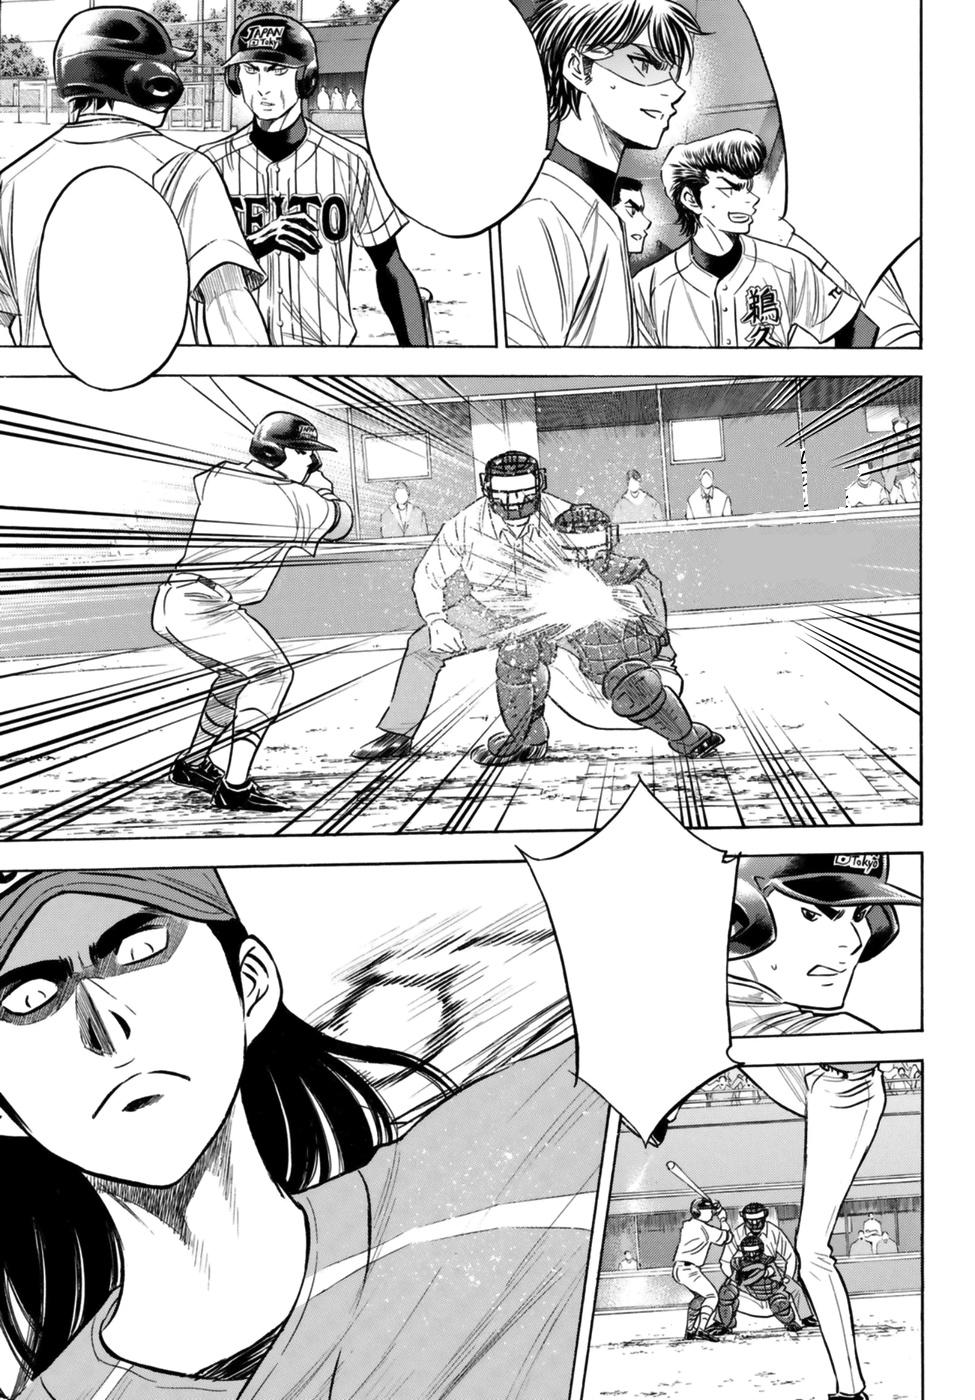 × Dark Storm × .. حيـن تعـصـف ريـآح الـإبدآع ! | Anime & Manga Translation - صفحة 2 Picsar10